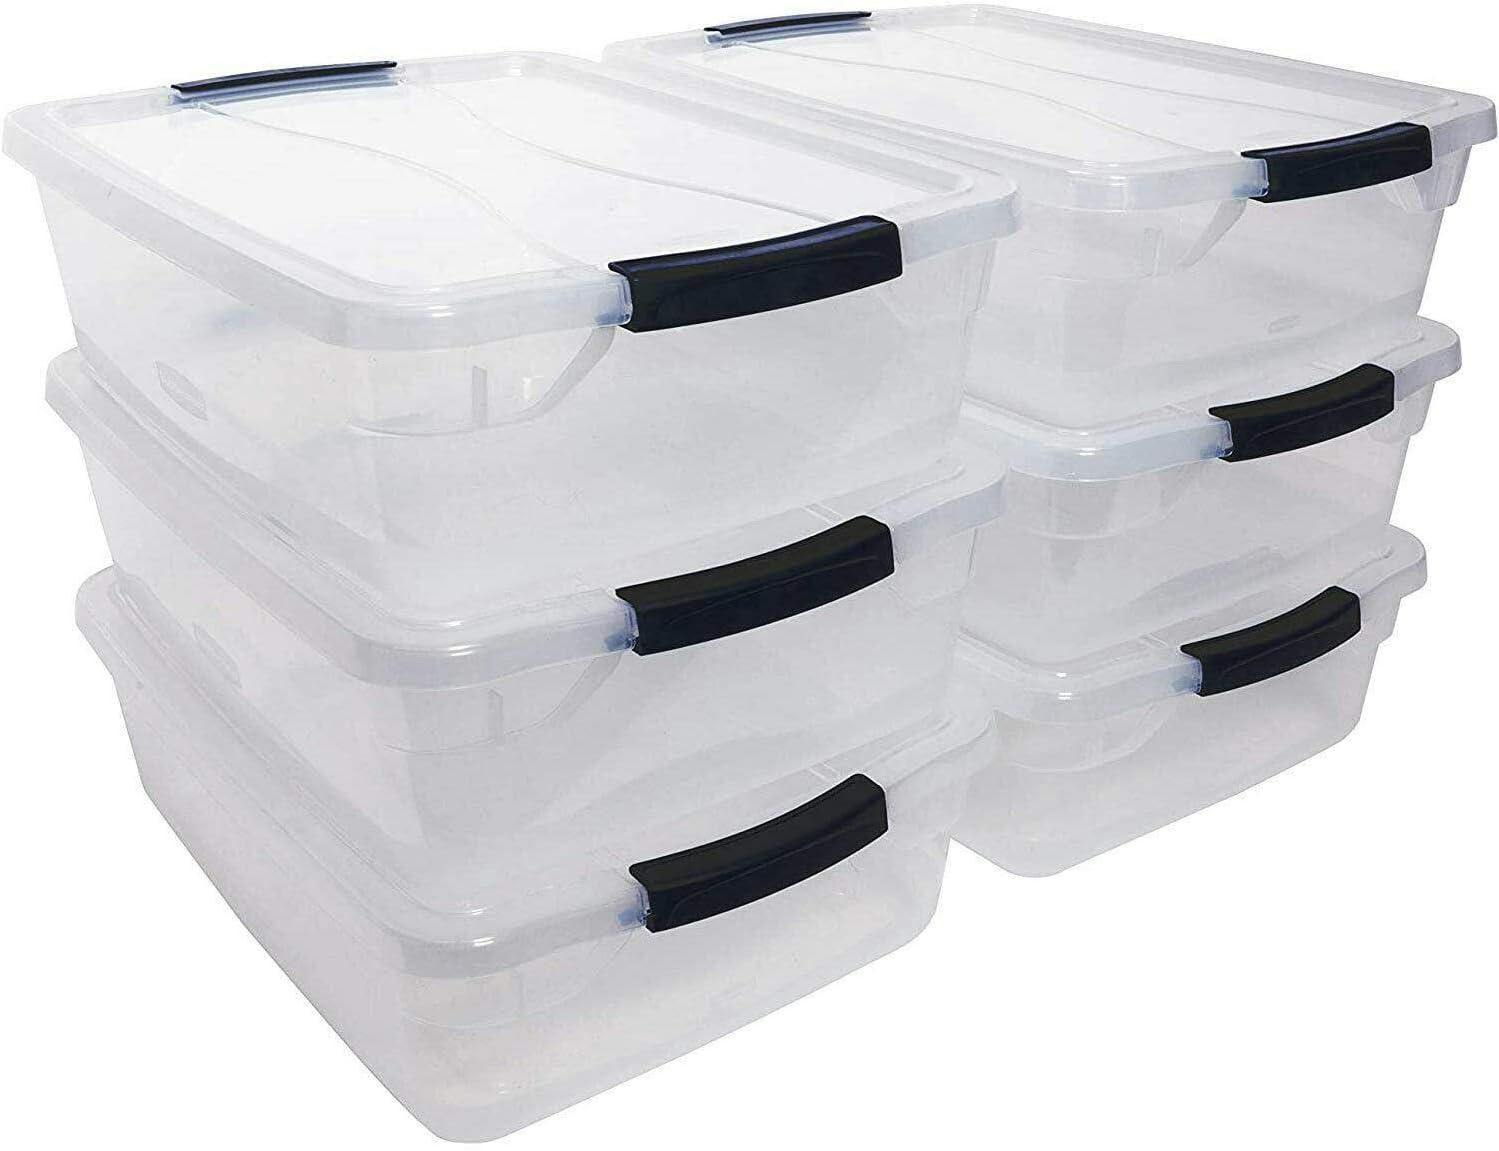 kuz 16 Quart Plastic Max 87% OFF Storage Tote -St with 6 Lid Pack Container Overseas parallel import regular item